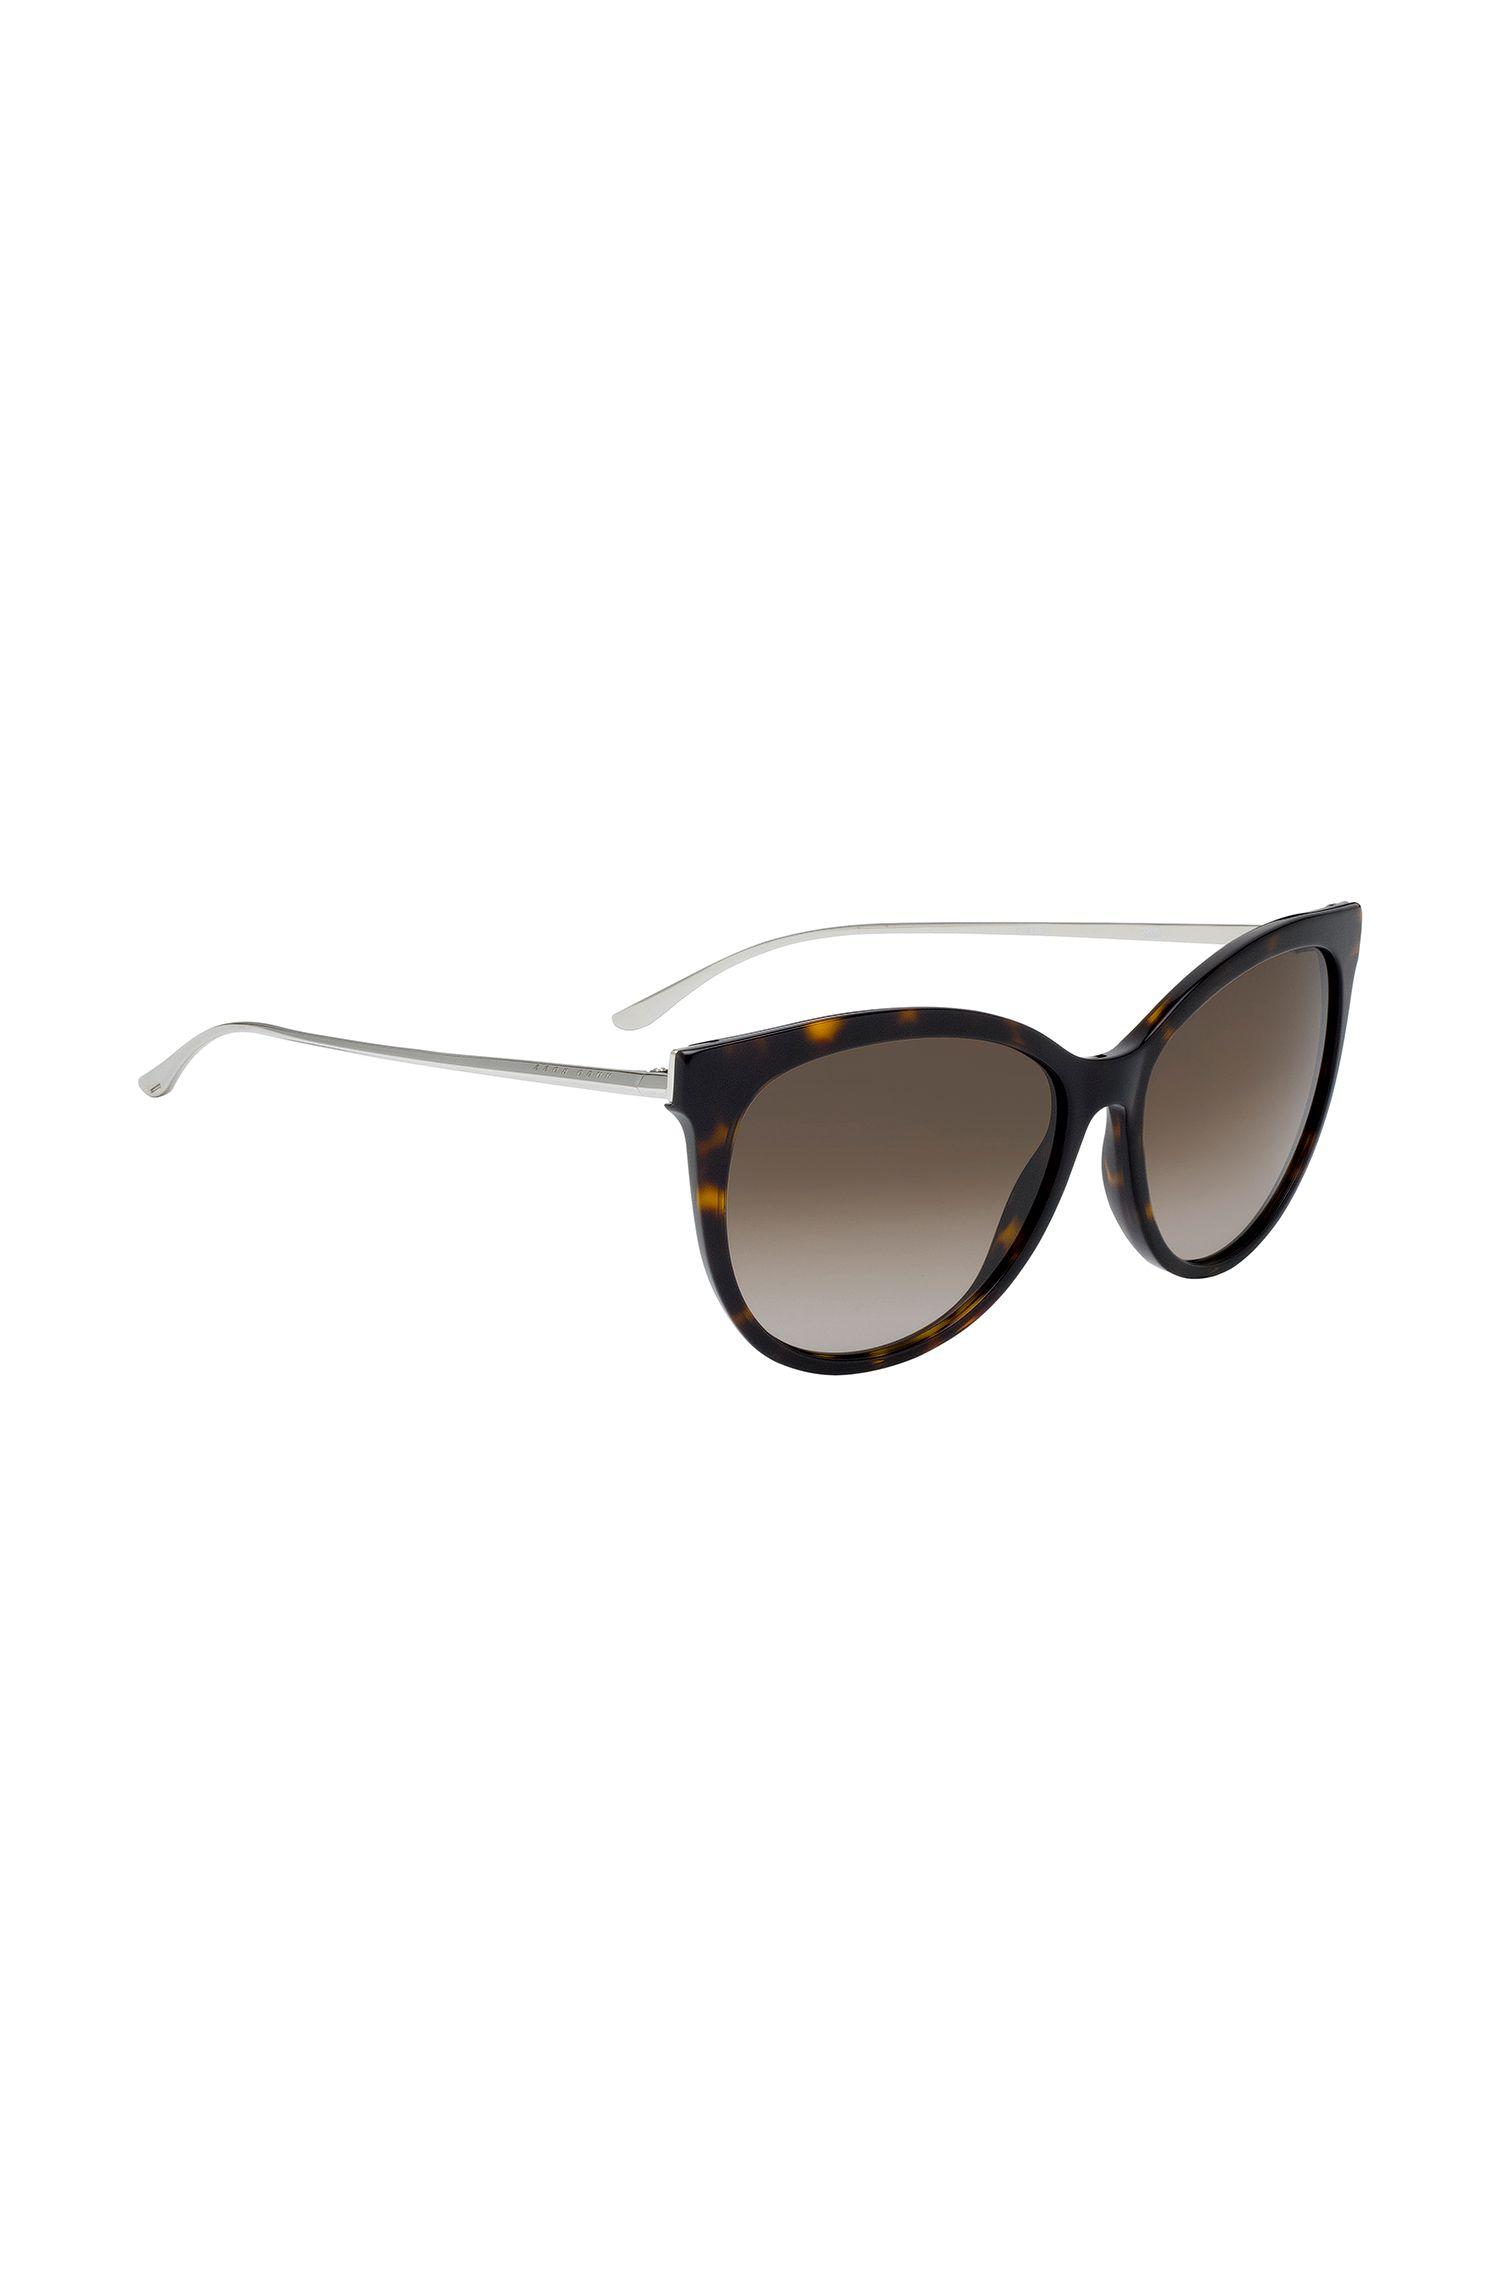 'BOSS 0892S'   Tortoiseshell Cat-Eye Sunglasses